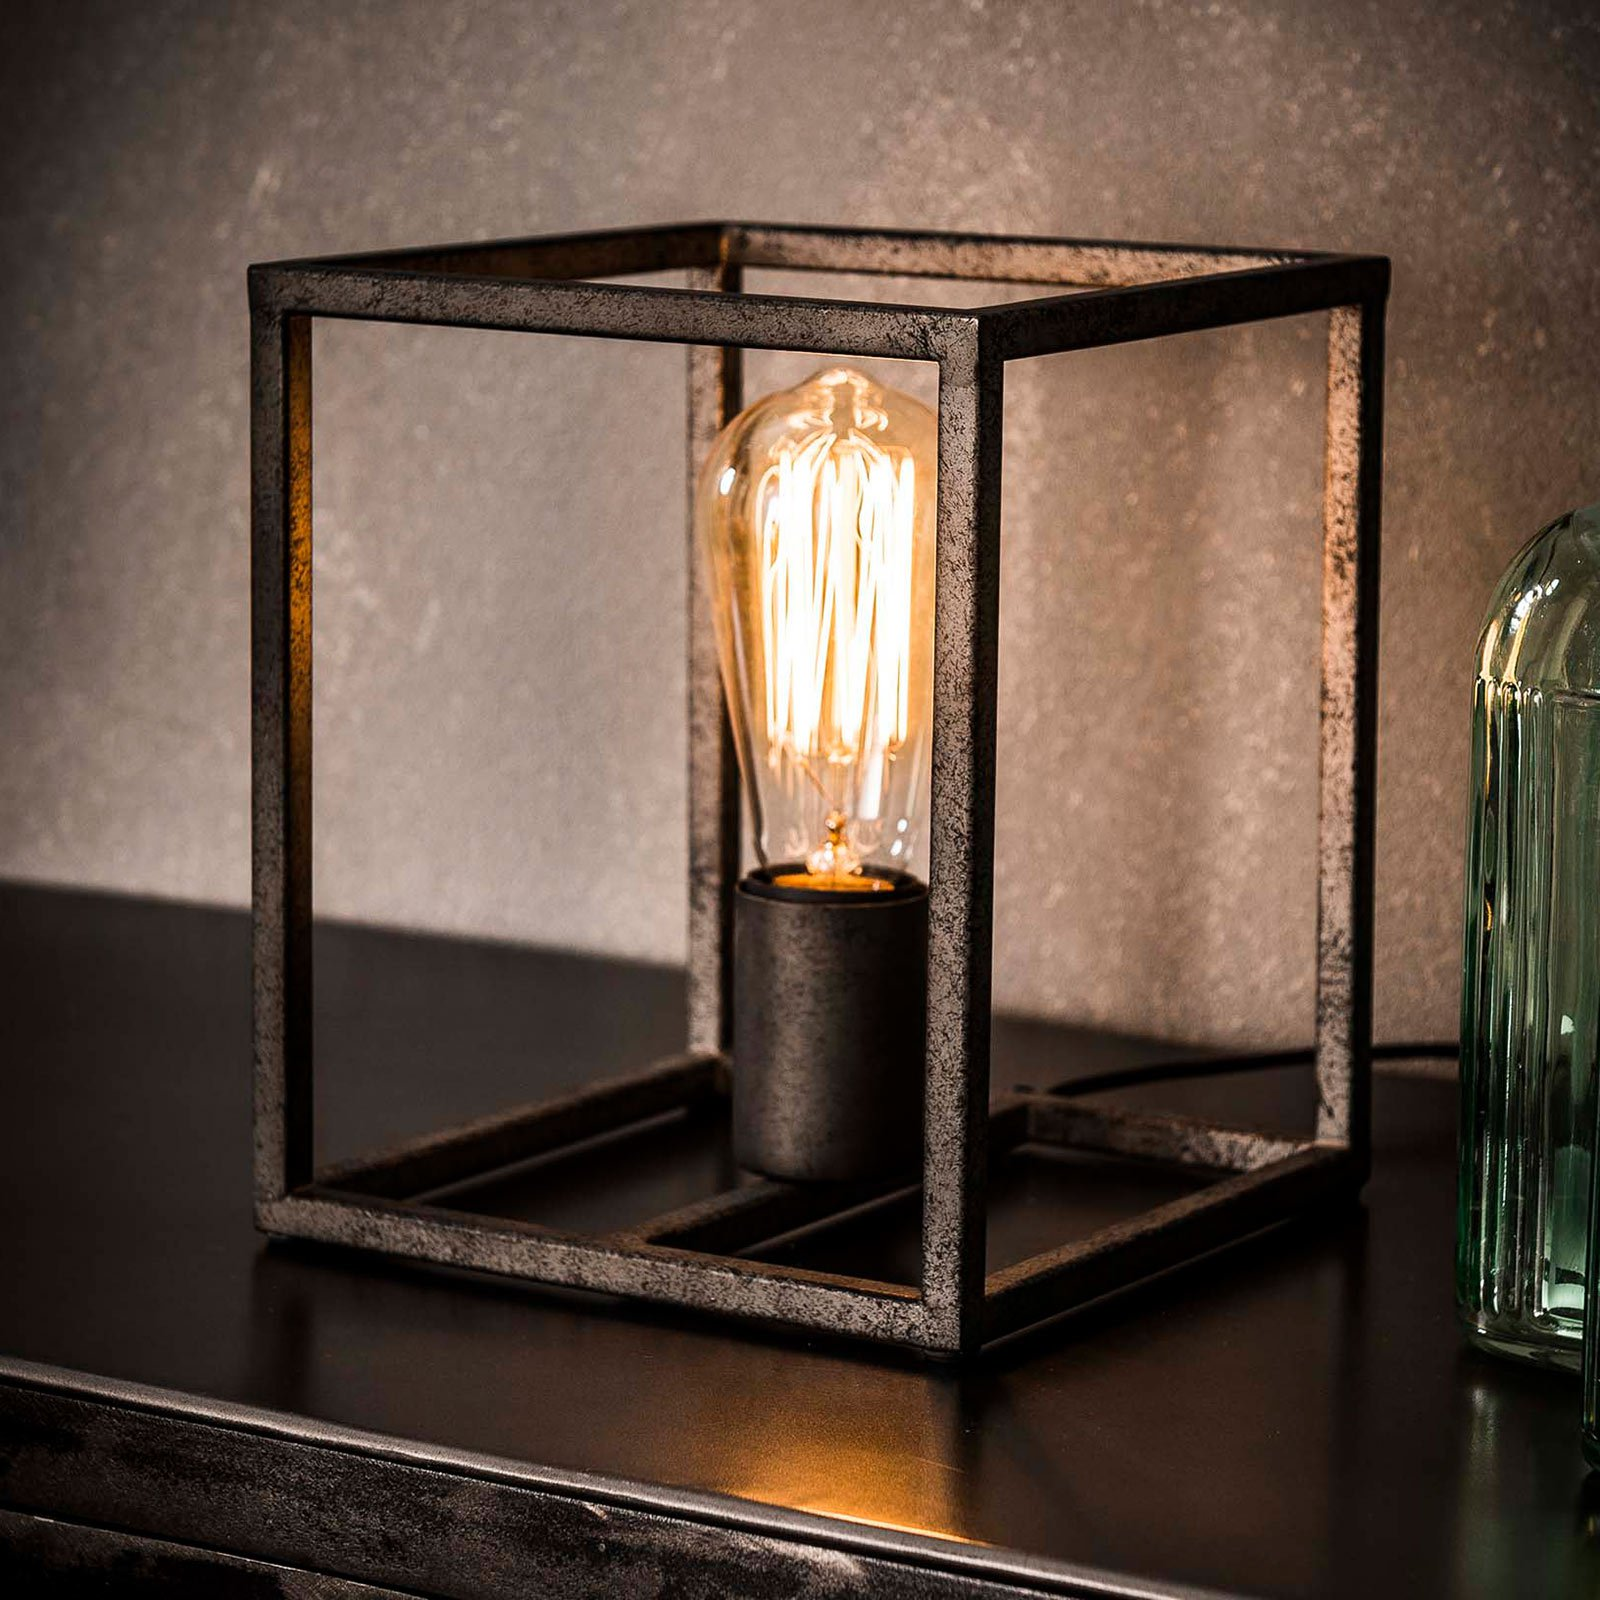 Bordlampe Perpendillumina i kubeform